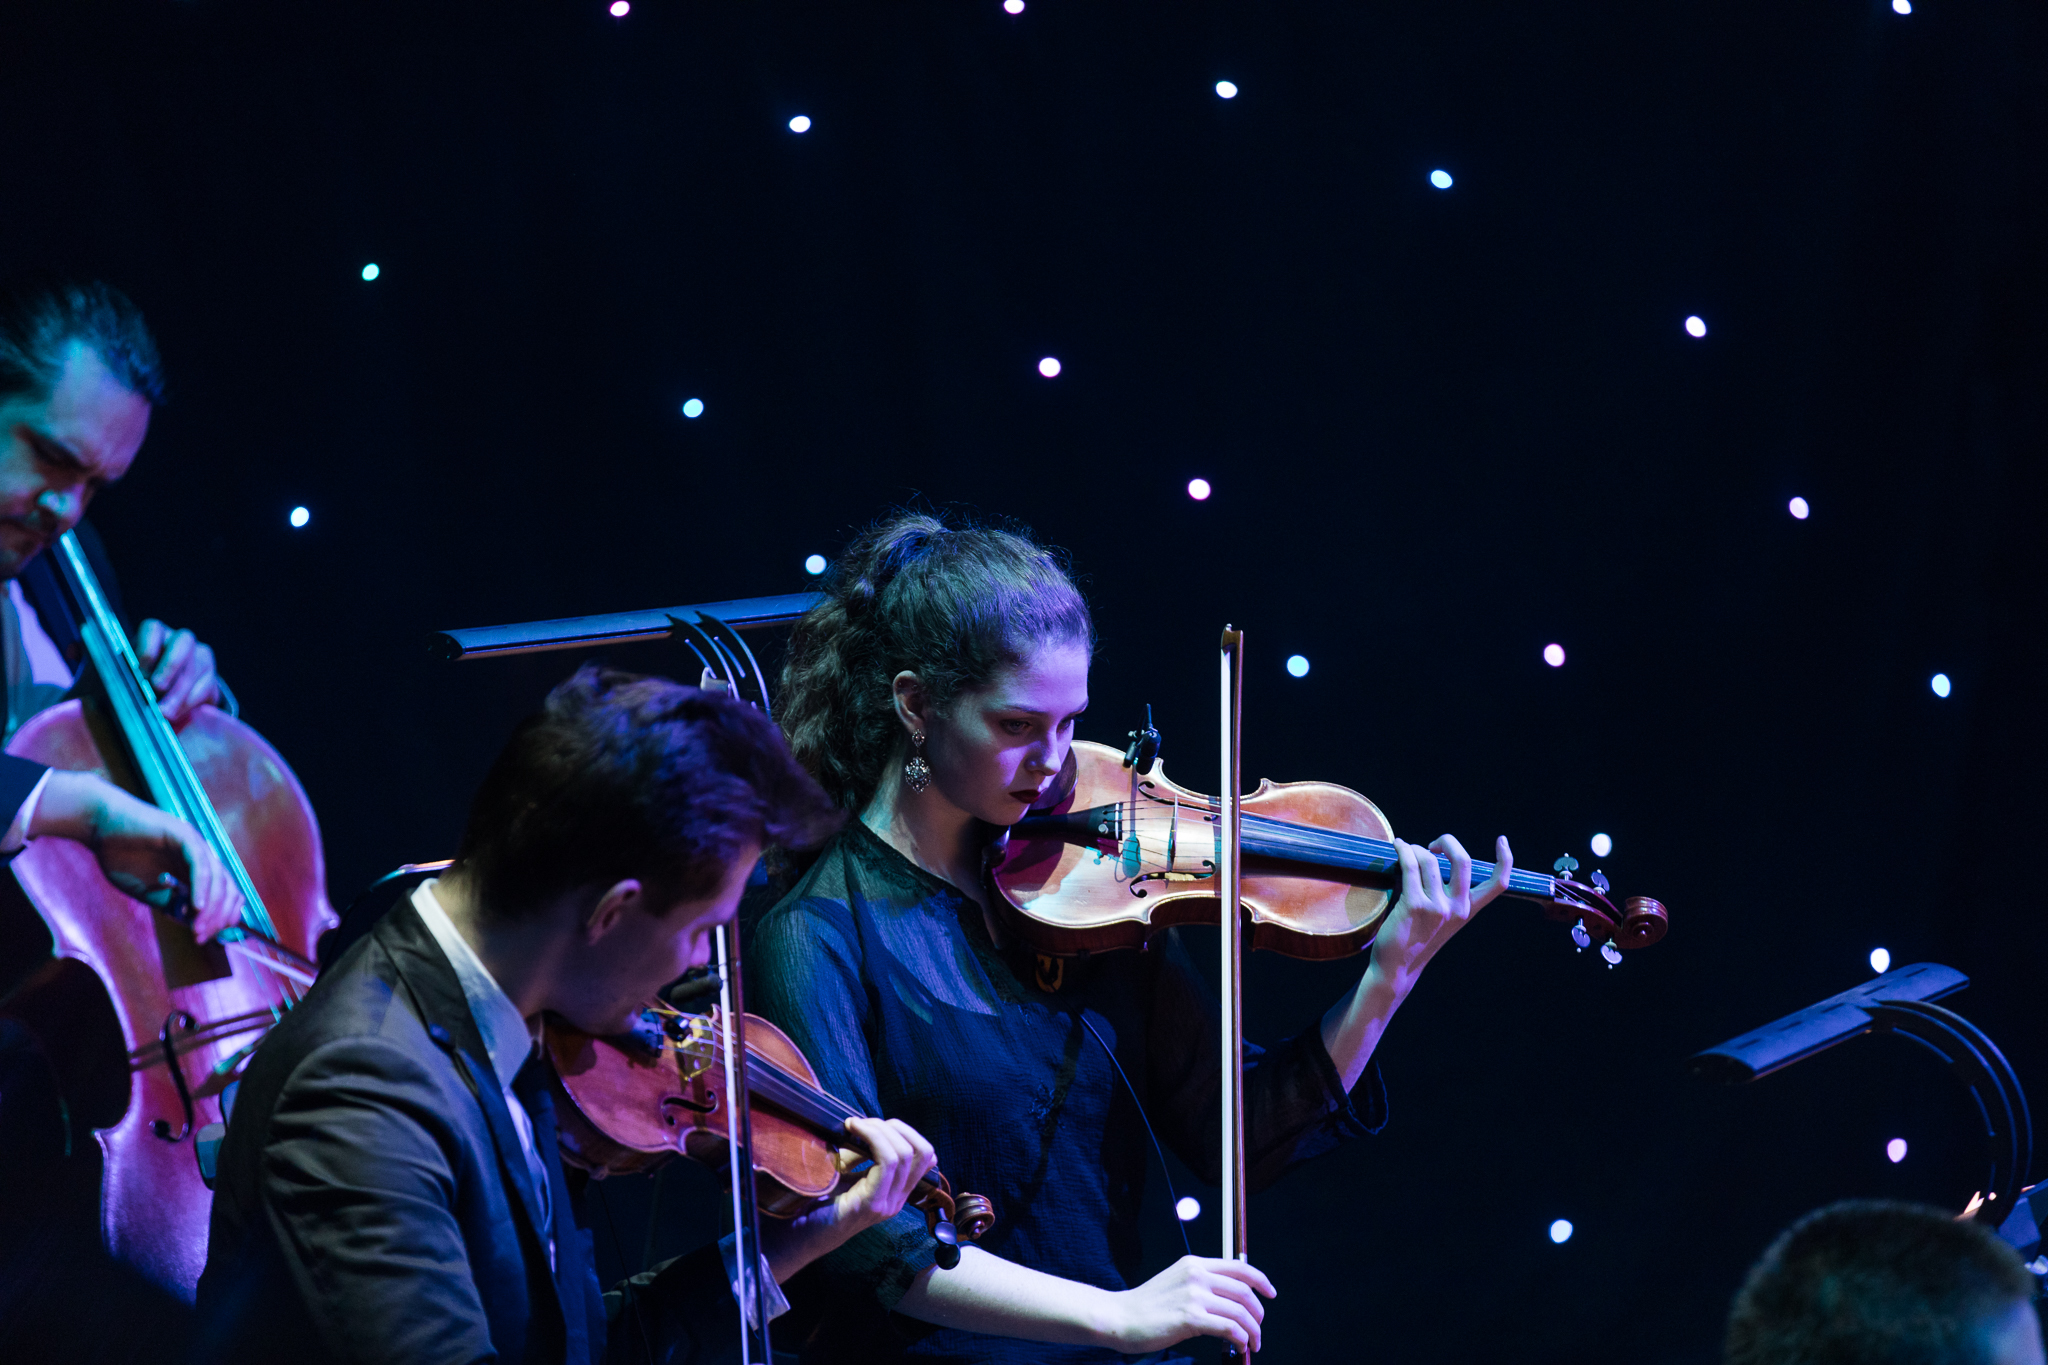 Young at heart orchestra playing violin